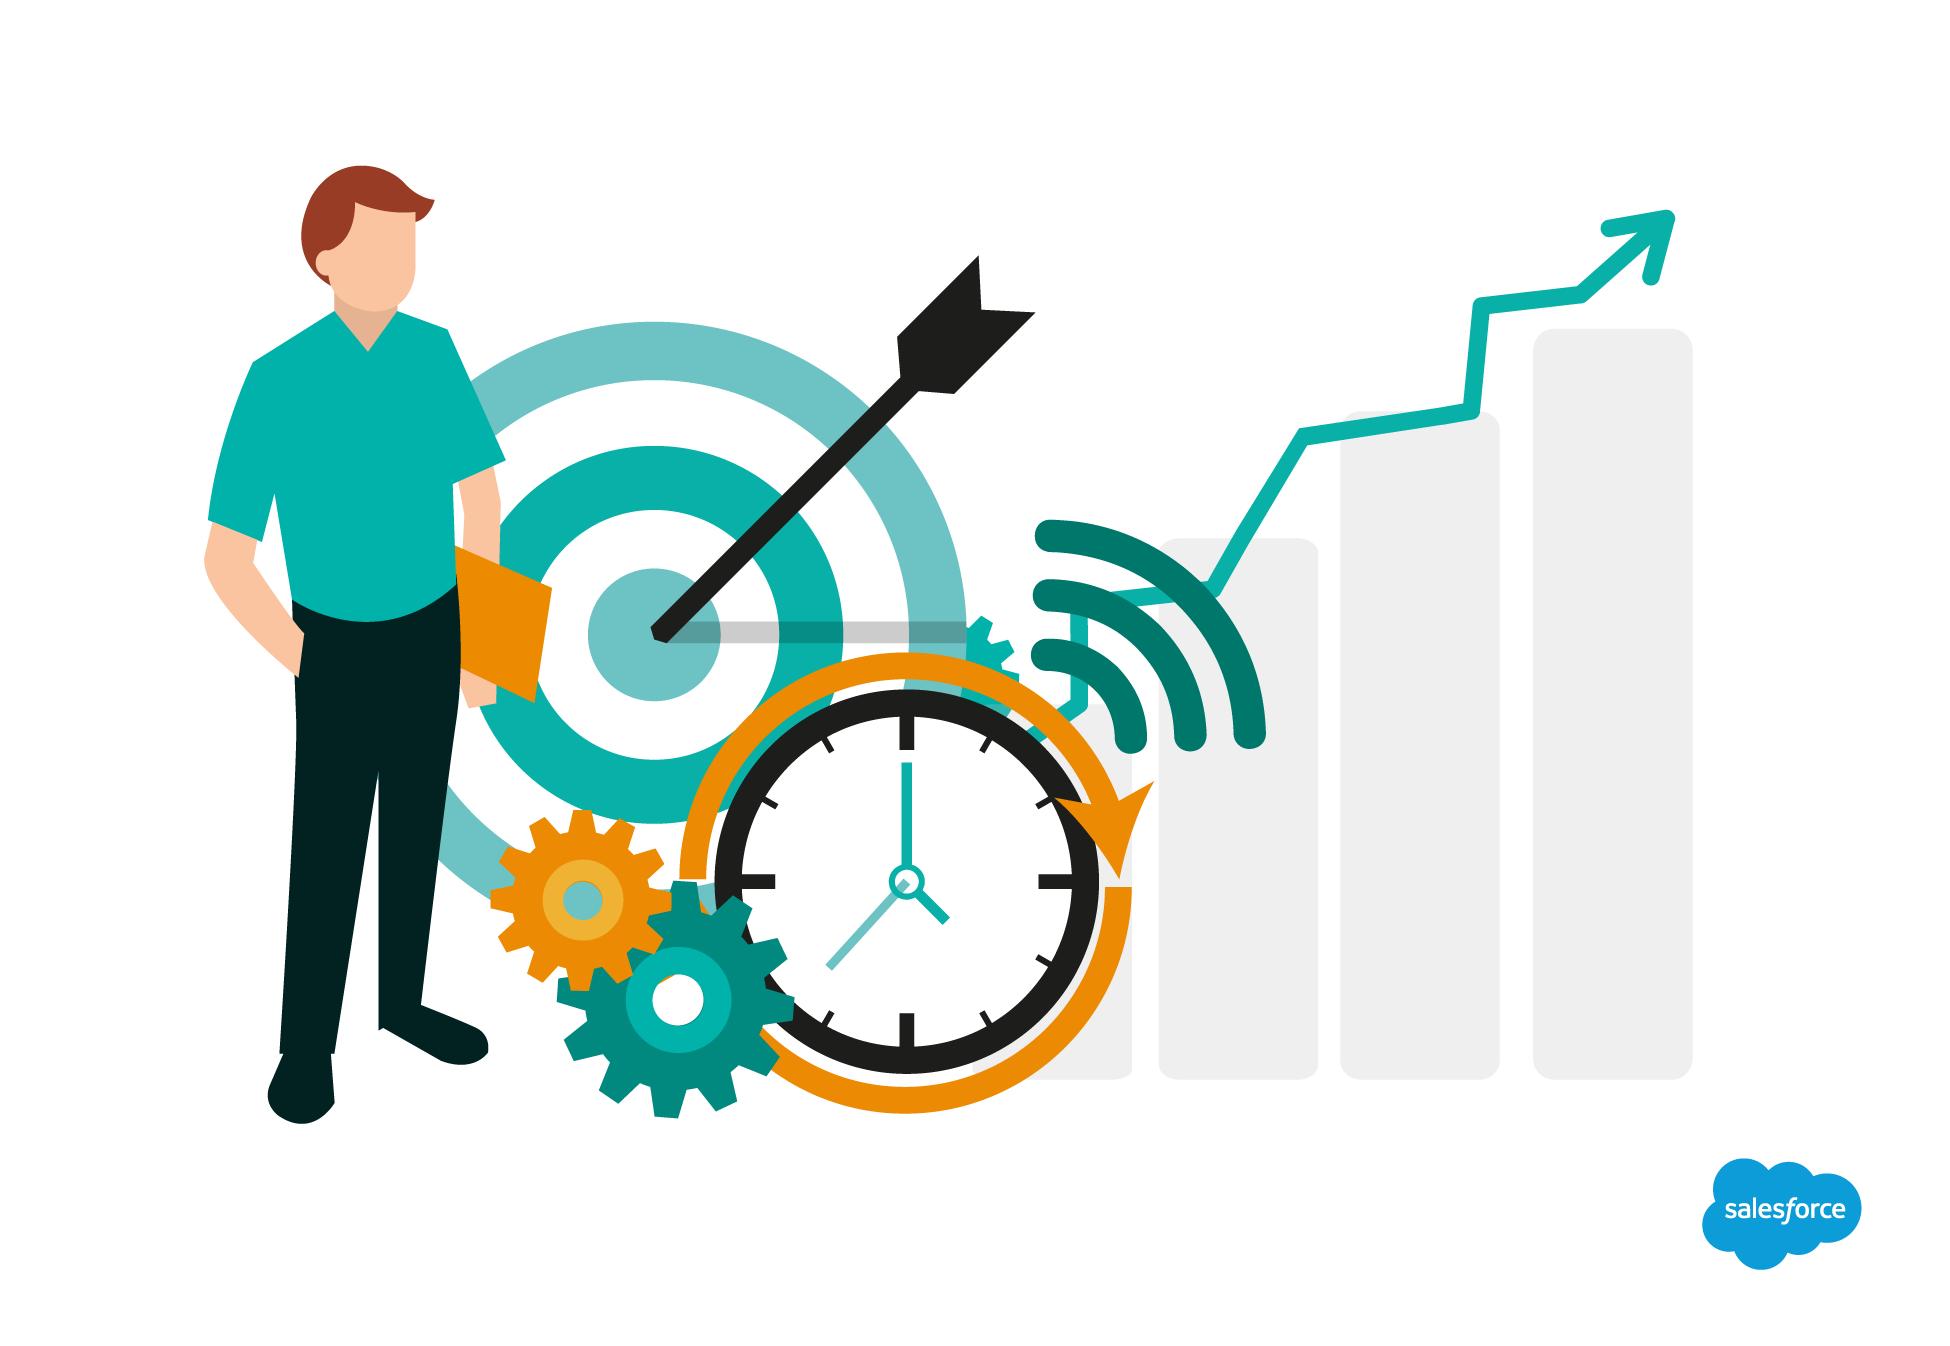 establish data quality metrics you can measure to track ROI